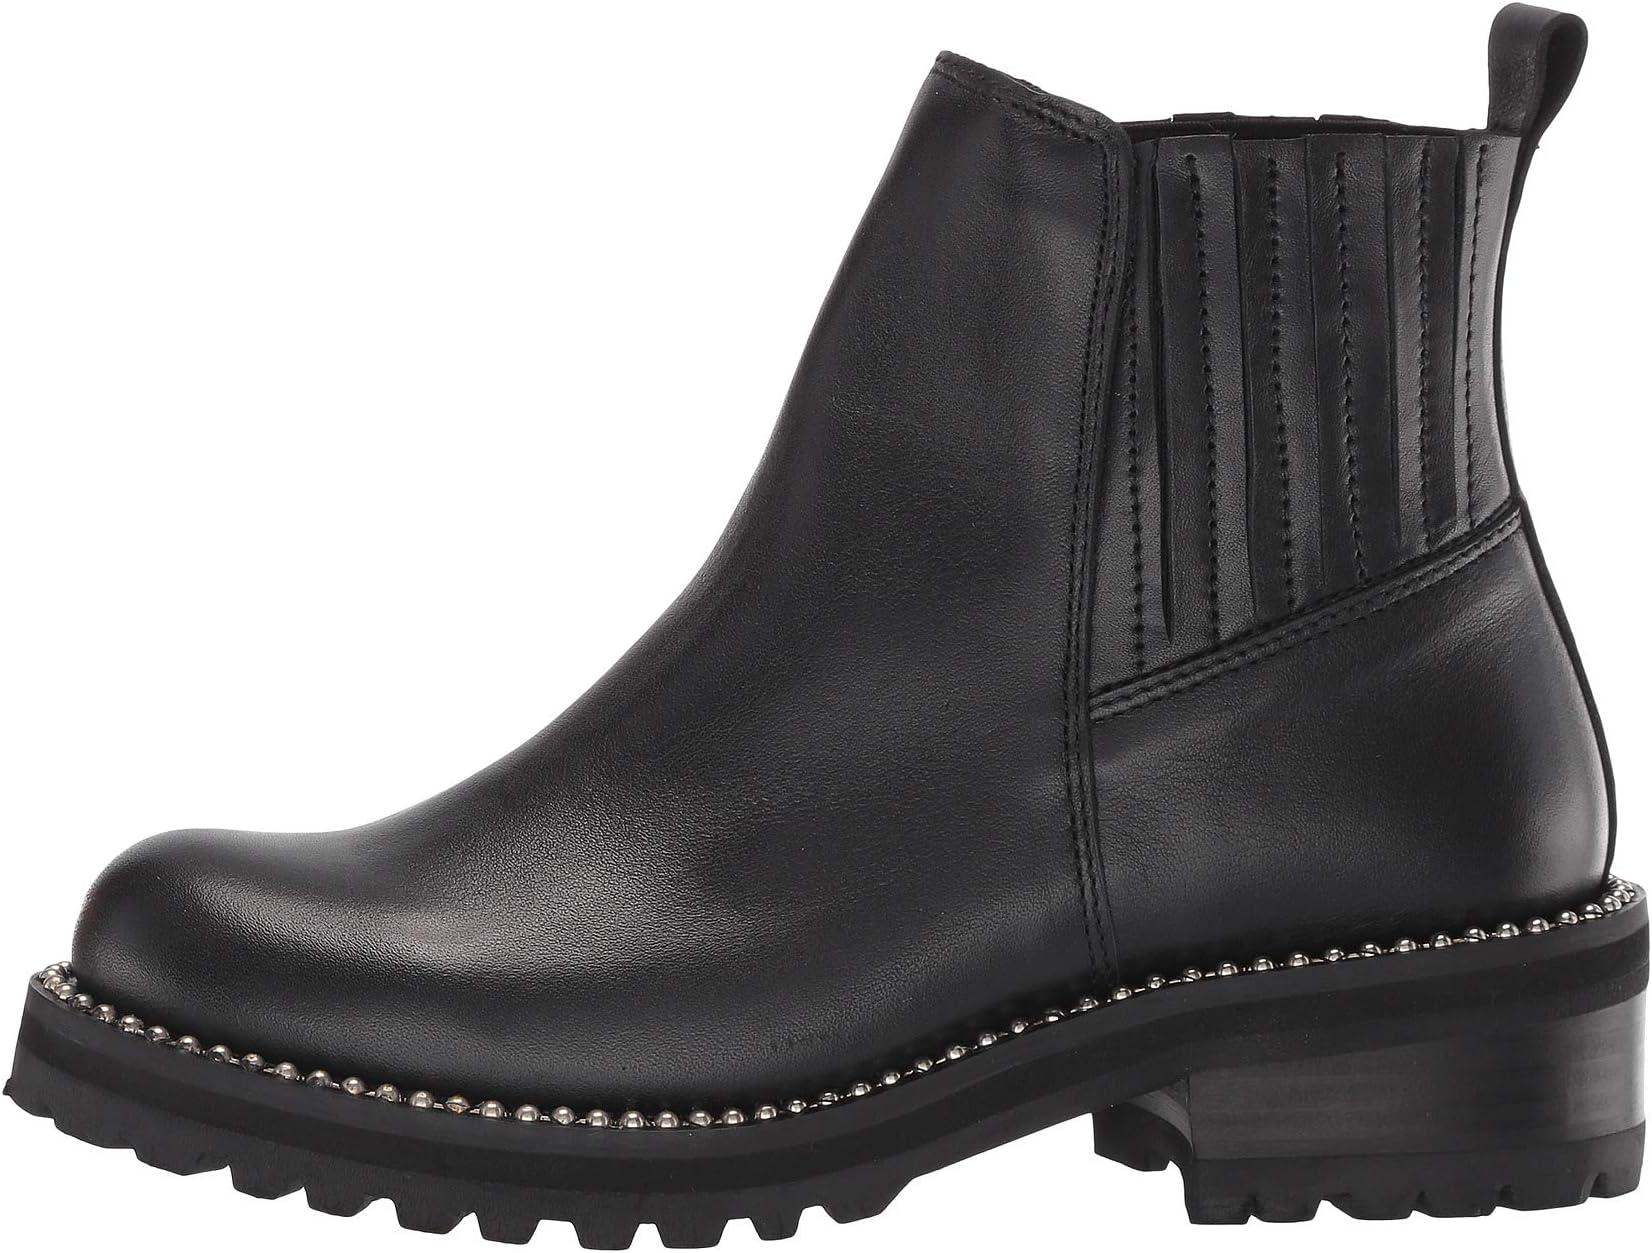 STEVEN NEW YORK Gibson   Women's shoes   2020 Newest